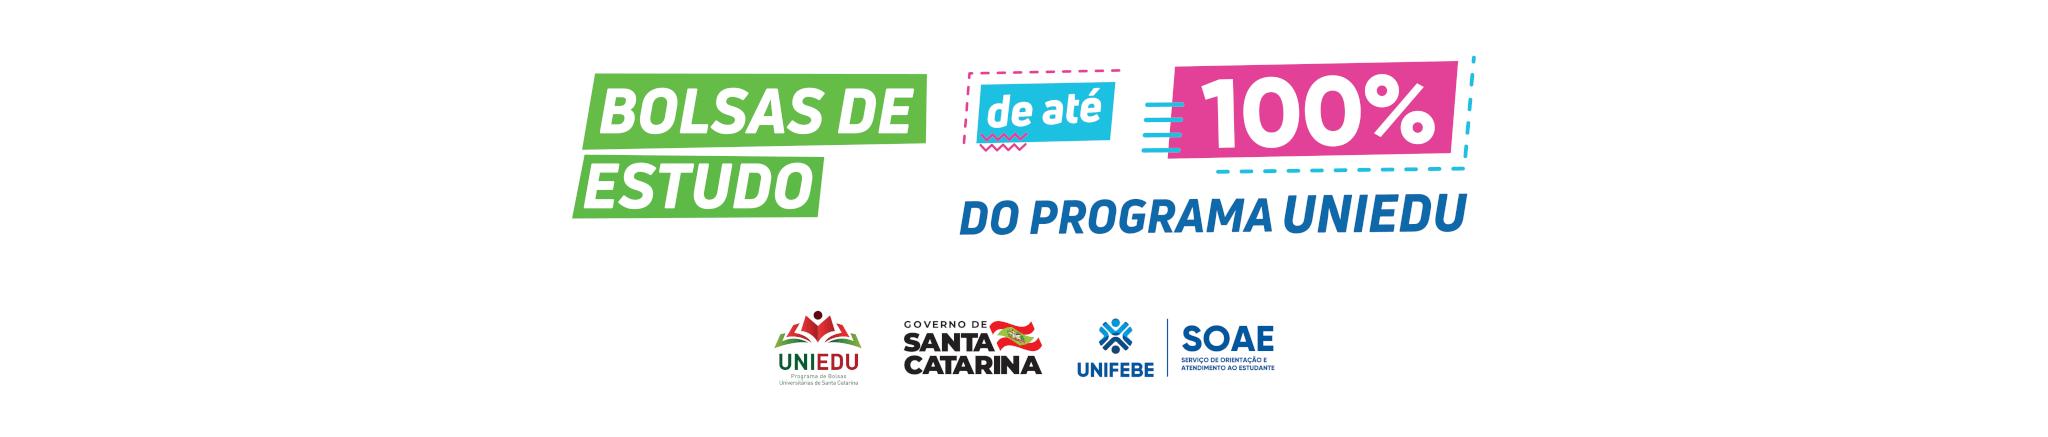 DESKTOP banner bolsas UNIEDU ABRIL 2020